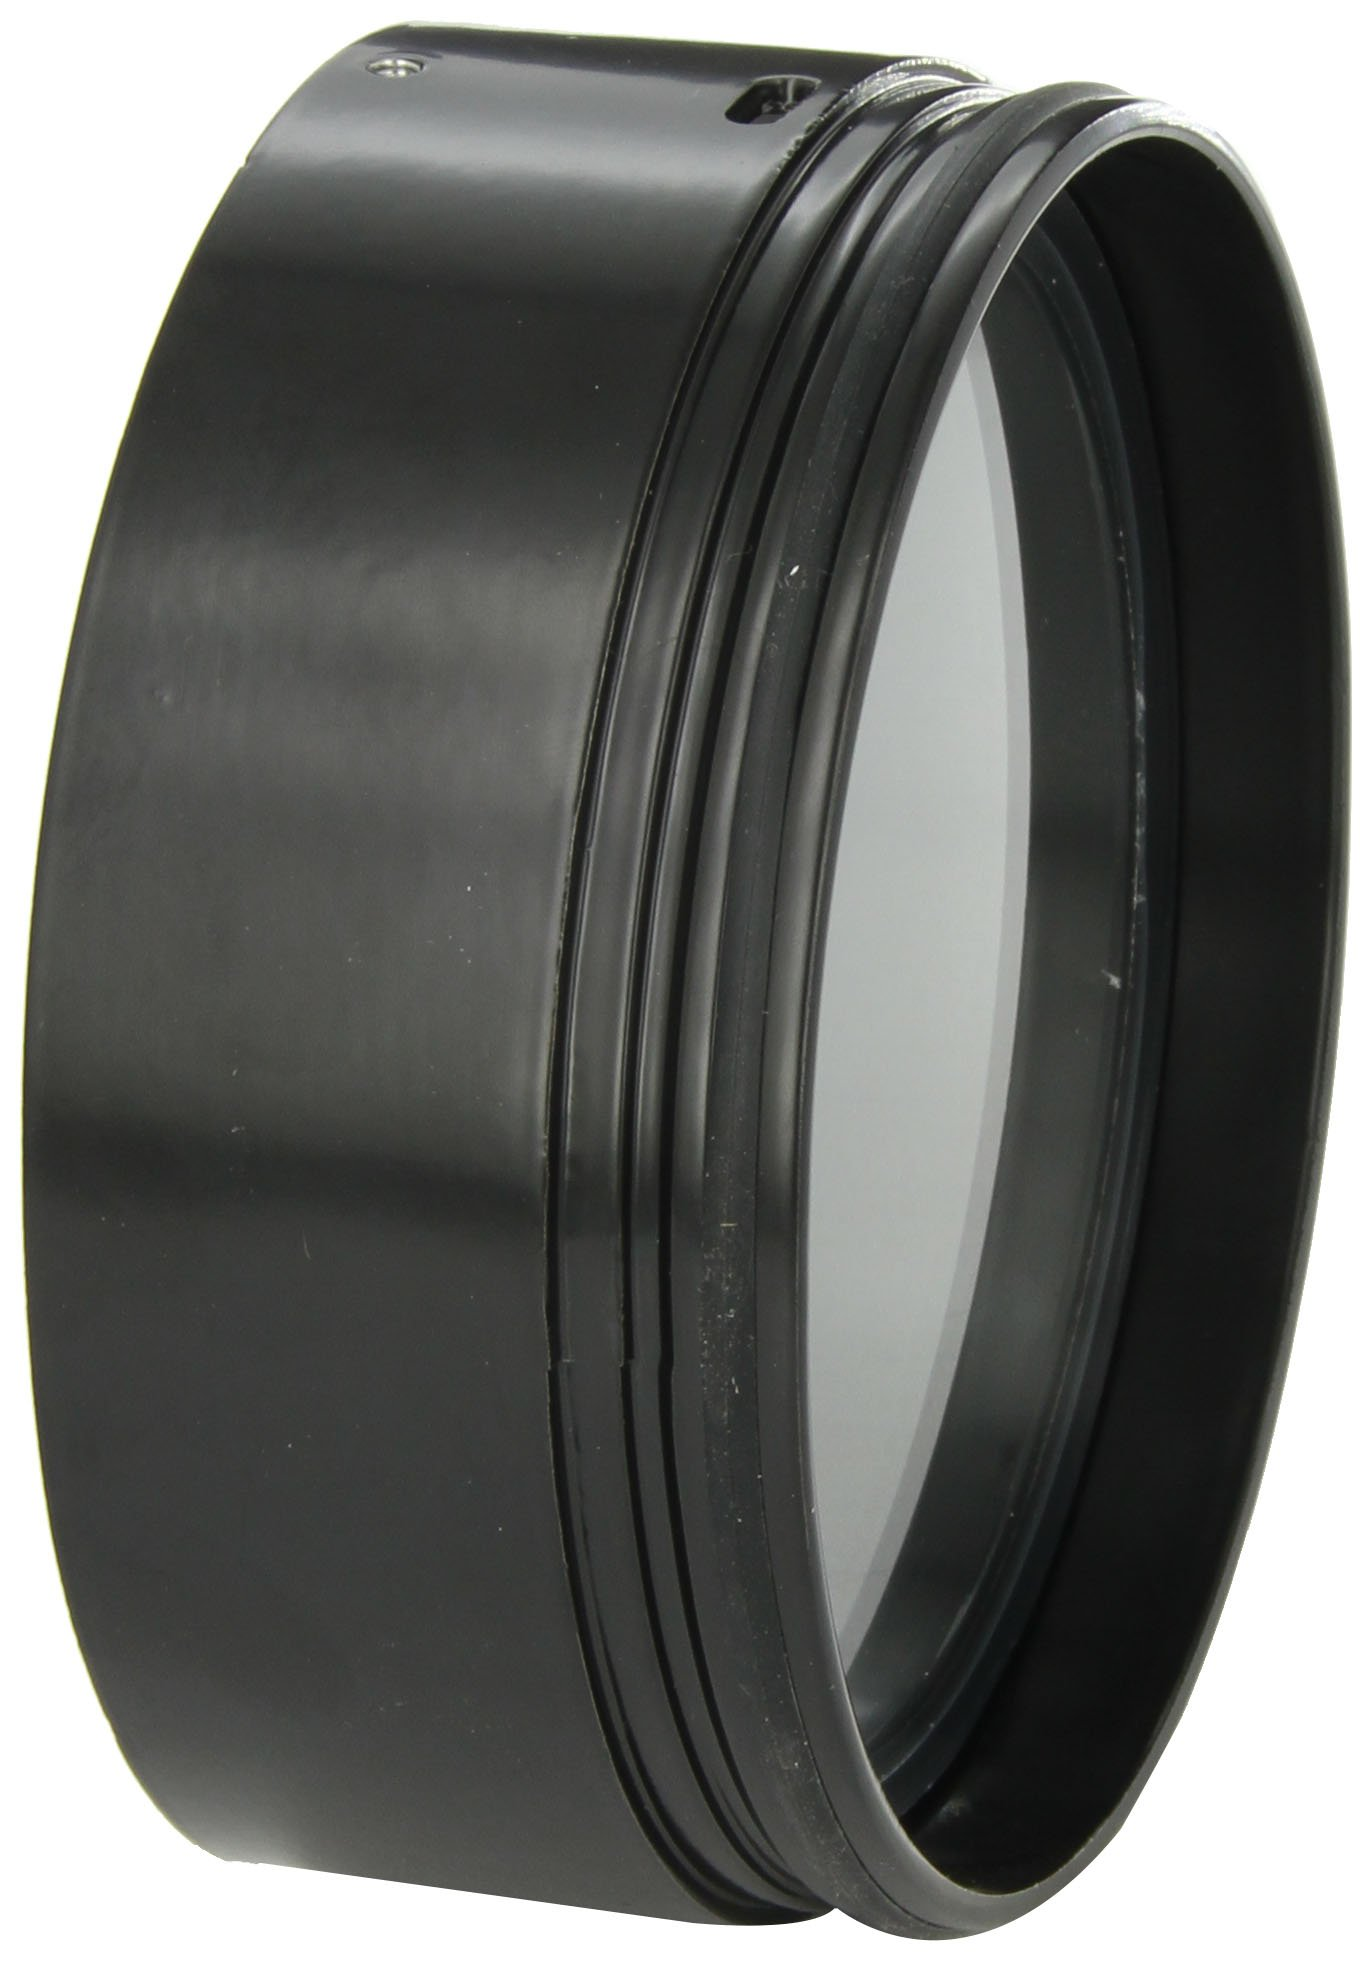 RAB Lighting HH1B H System Hood, Aluminum, 5-5/8'' Diameter x 2-1/4'' Height, Black by RAB Lighting (Image #1)